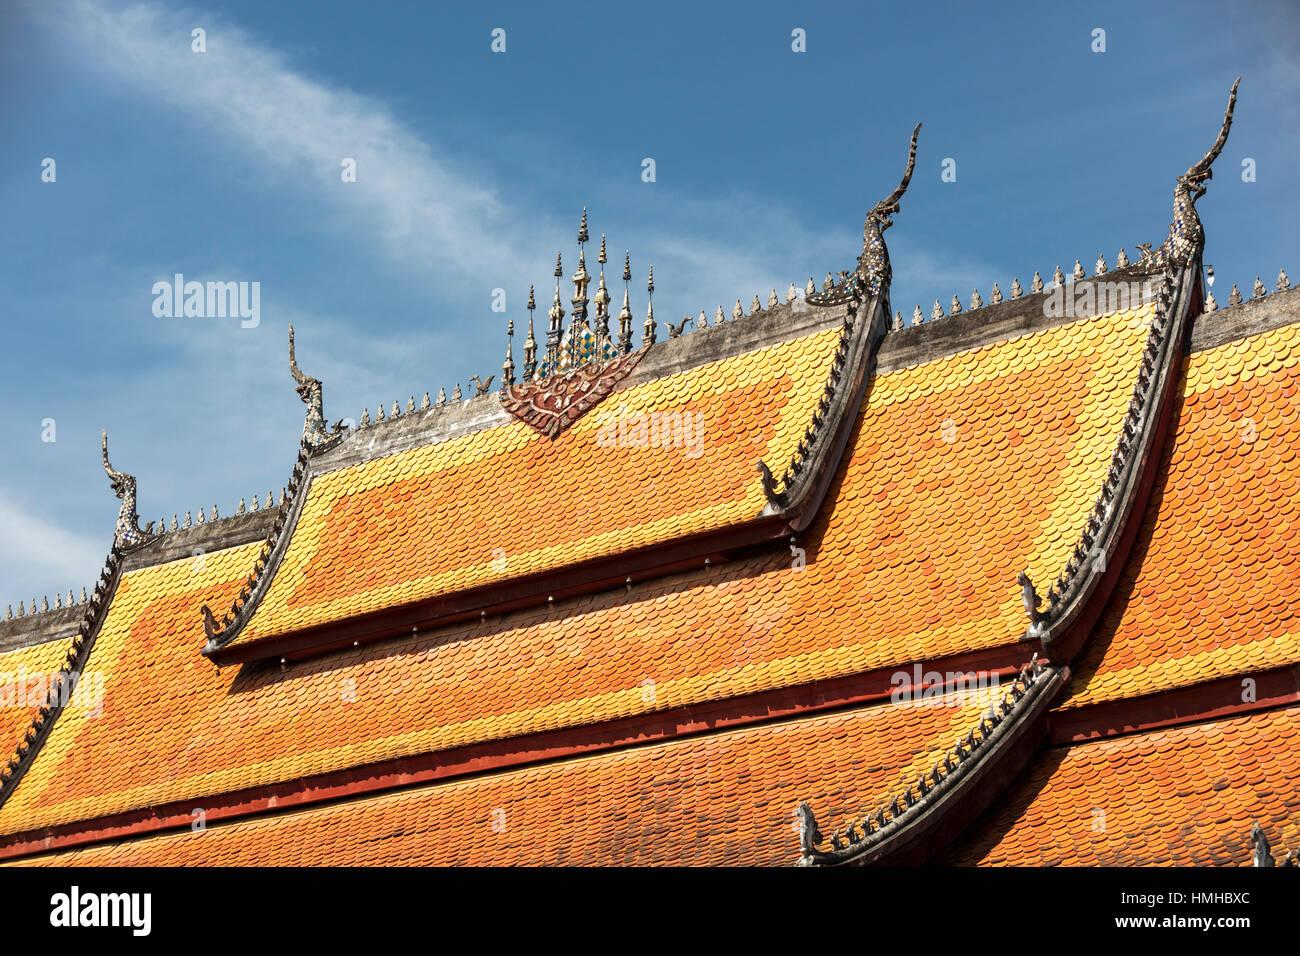 Dach des Wat Sensouhkaram, Sakkarine Rd, Luang Prabang, Laos Stockbild